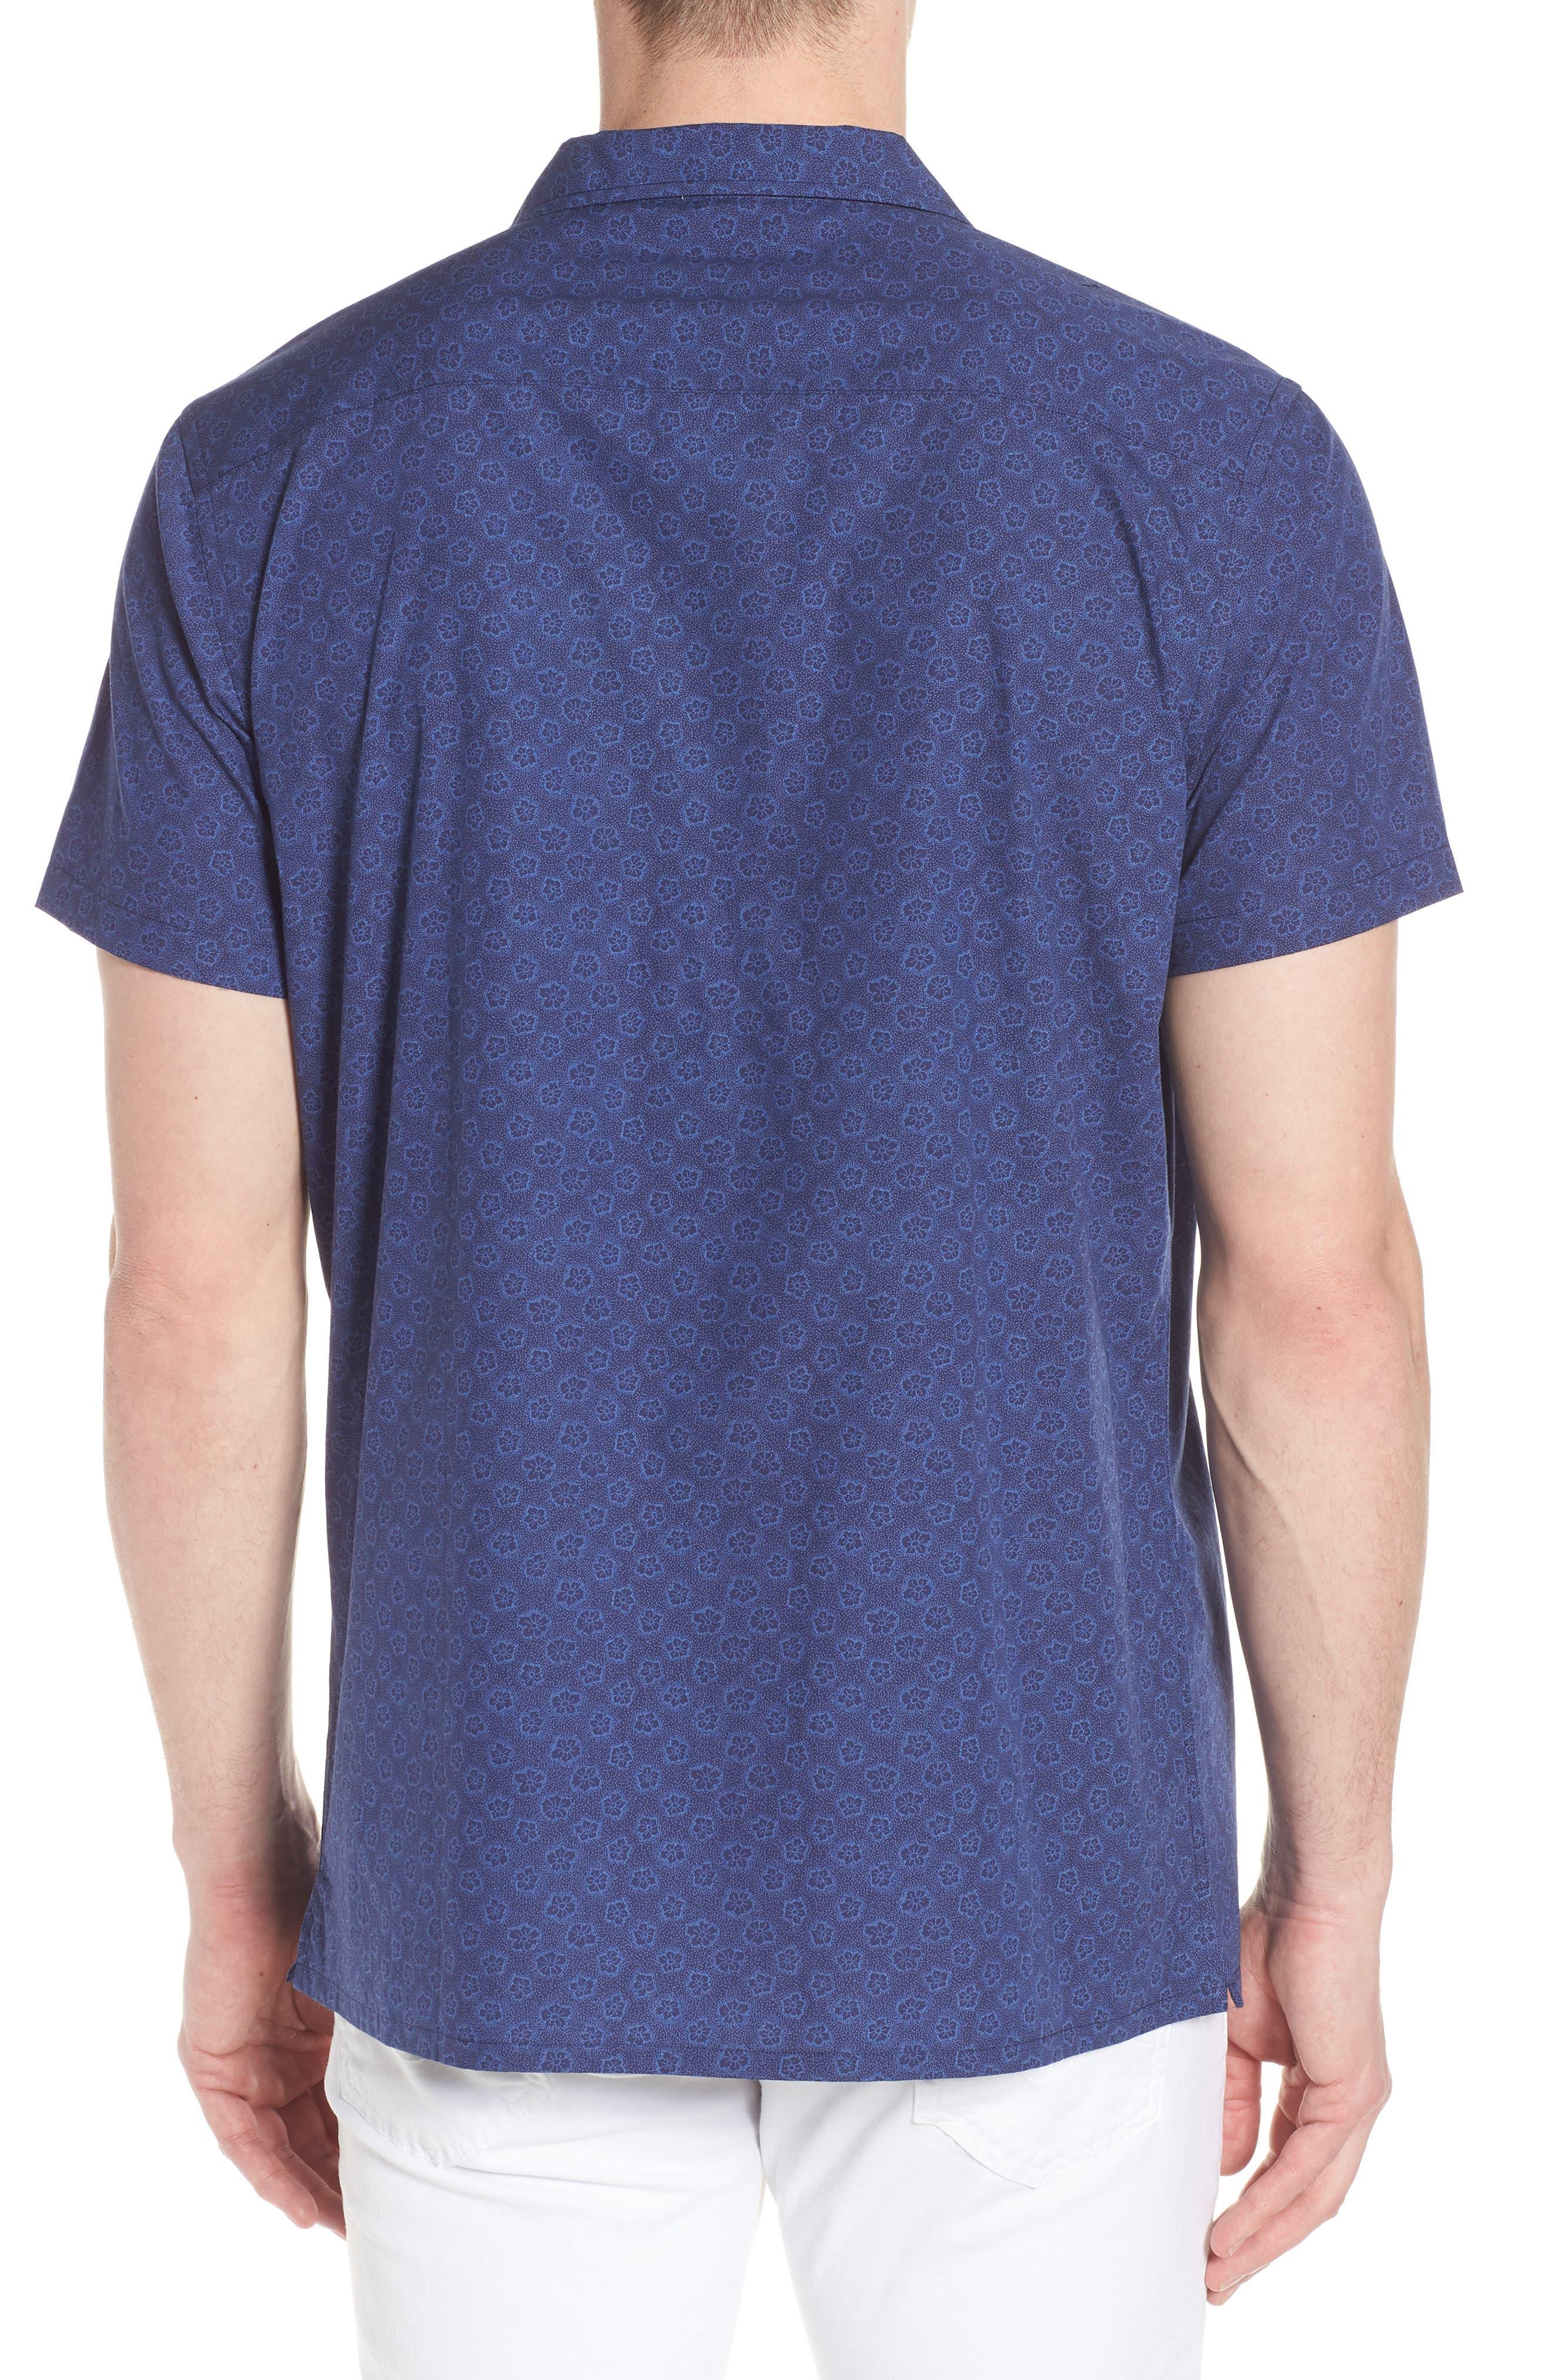 COASTAORO,                             Camp Corones Regular Fit Short Sleeve Sport Shirt,                             Alternate thumbnail 2, color,                             410